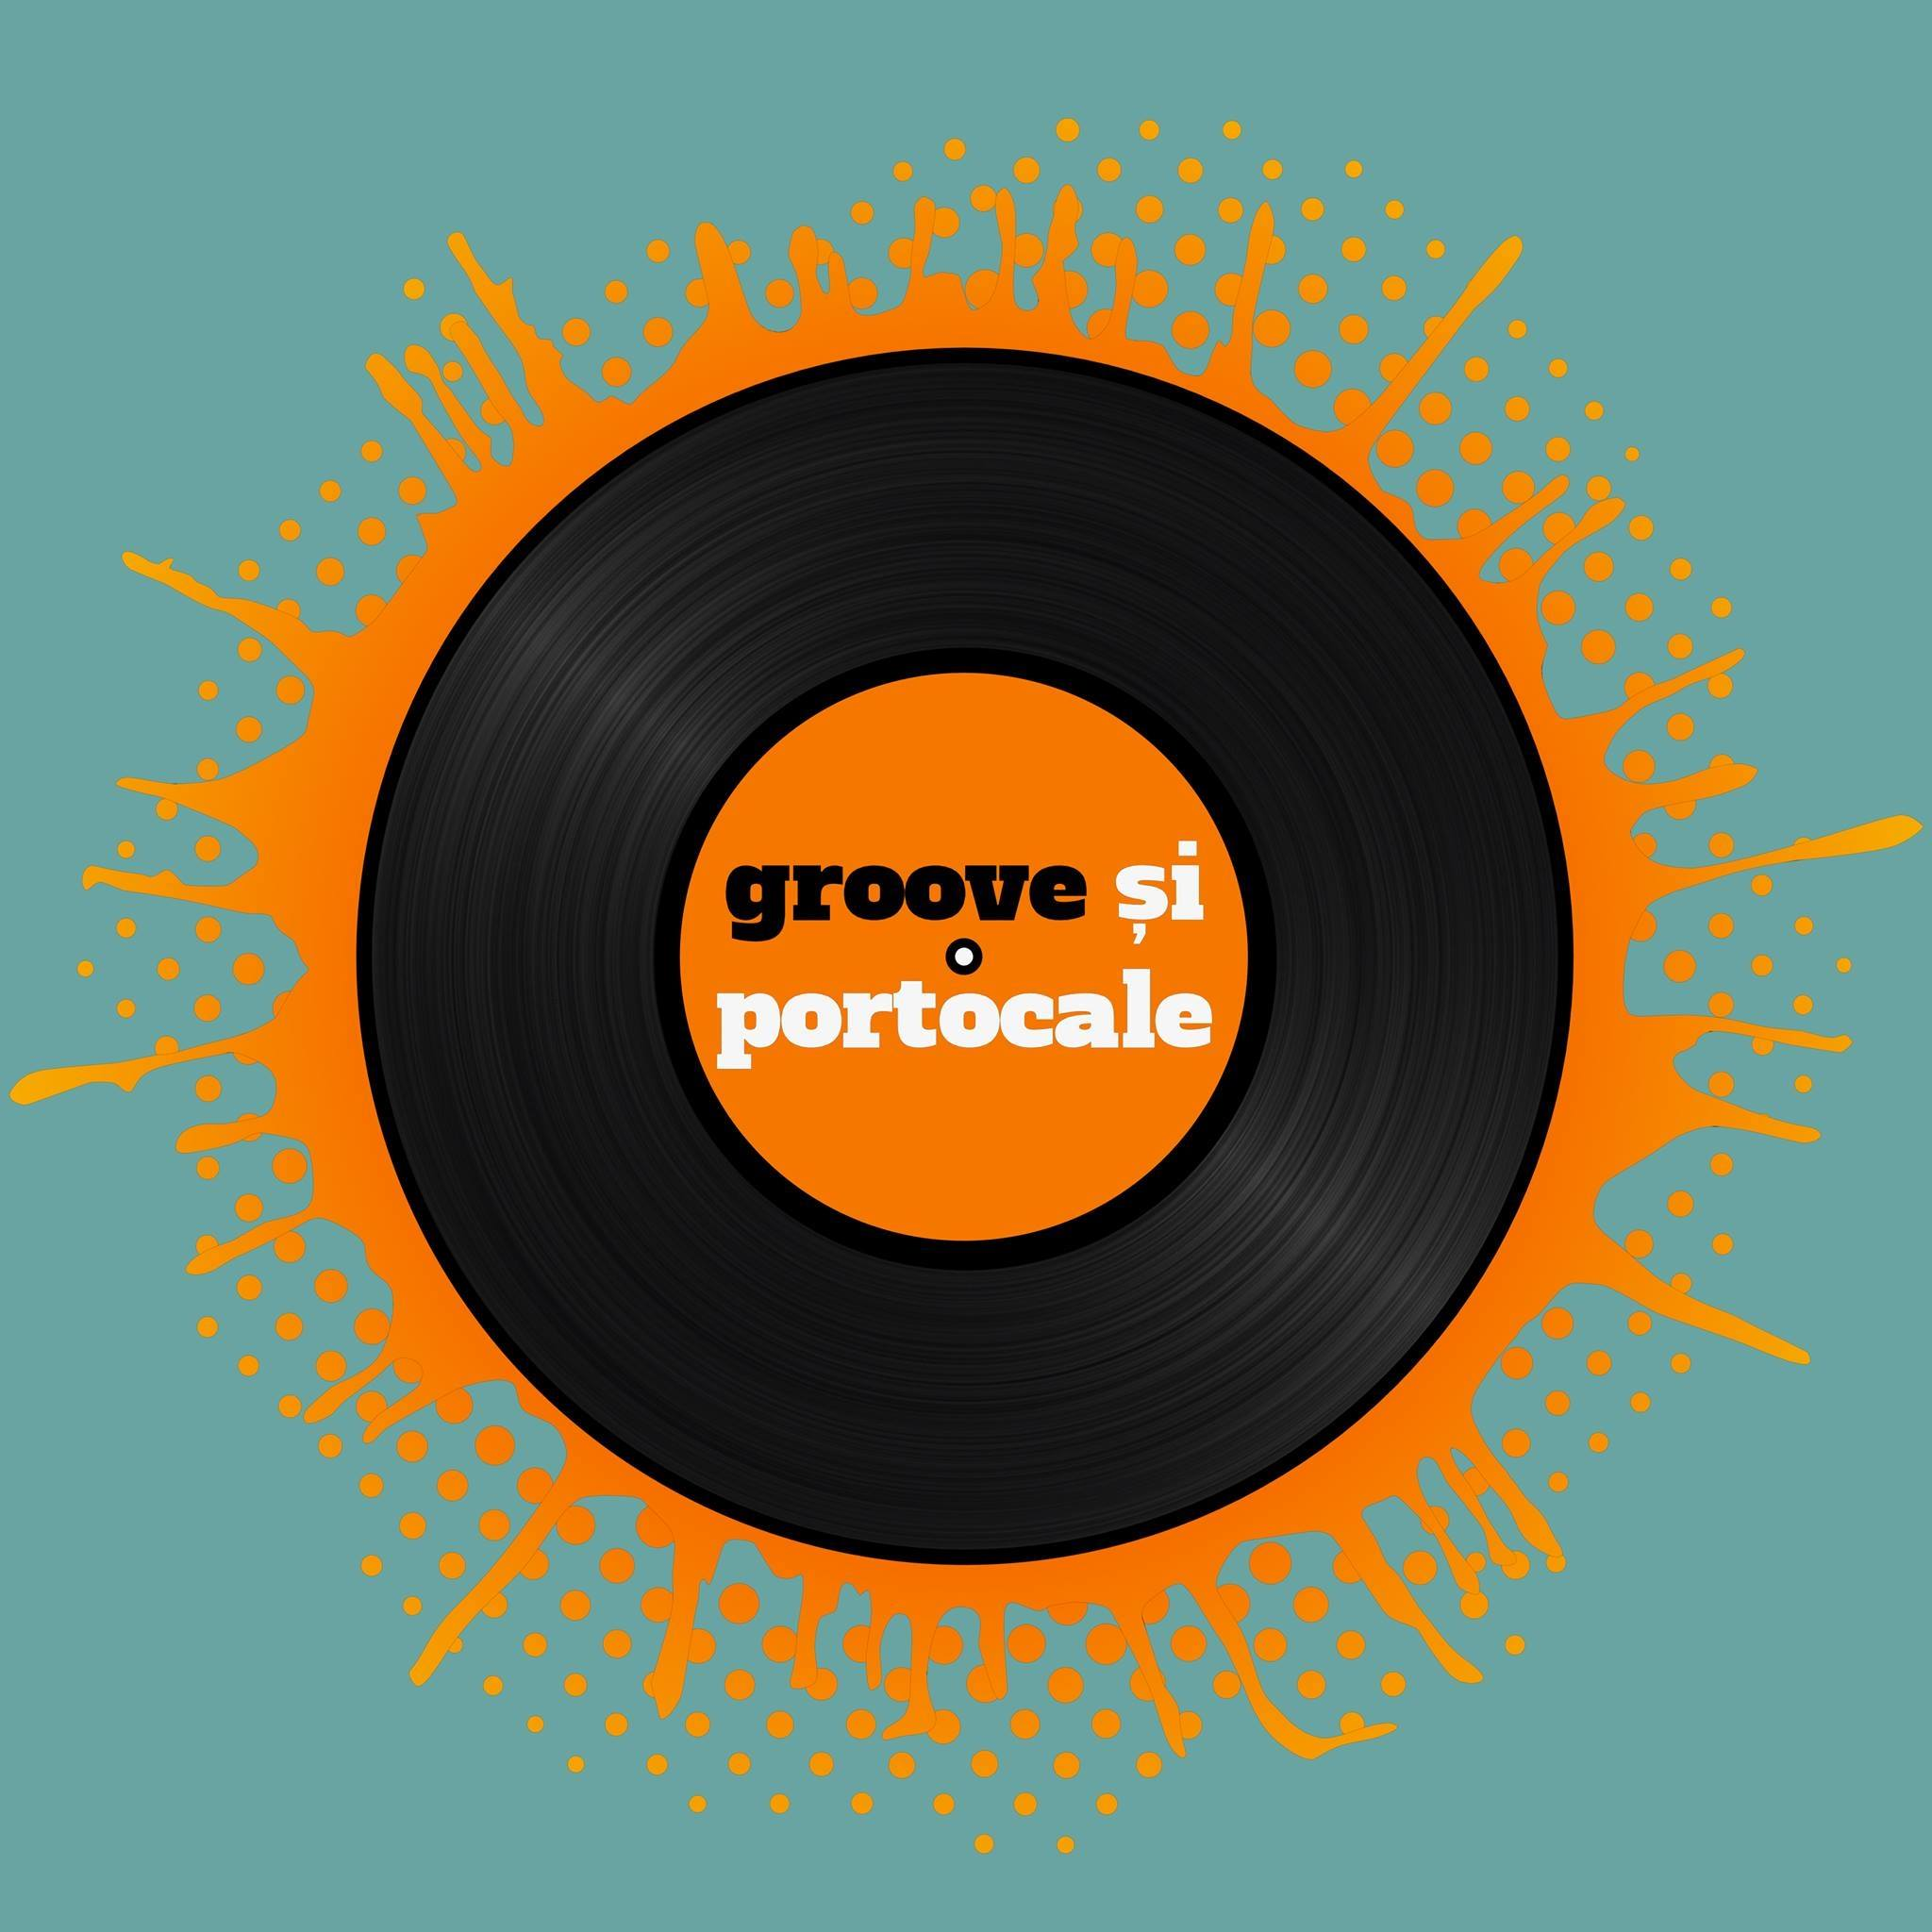 Groove si Portocale